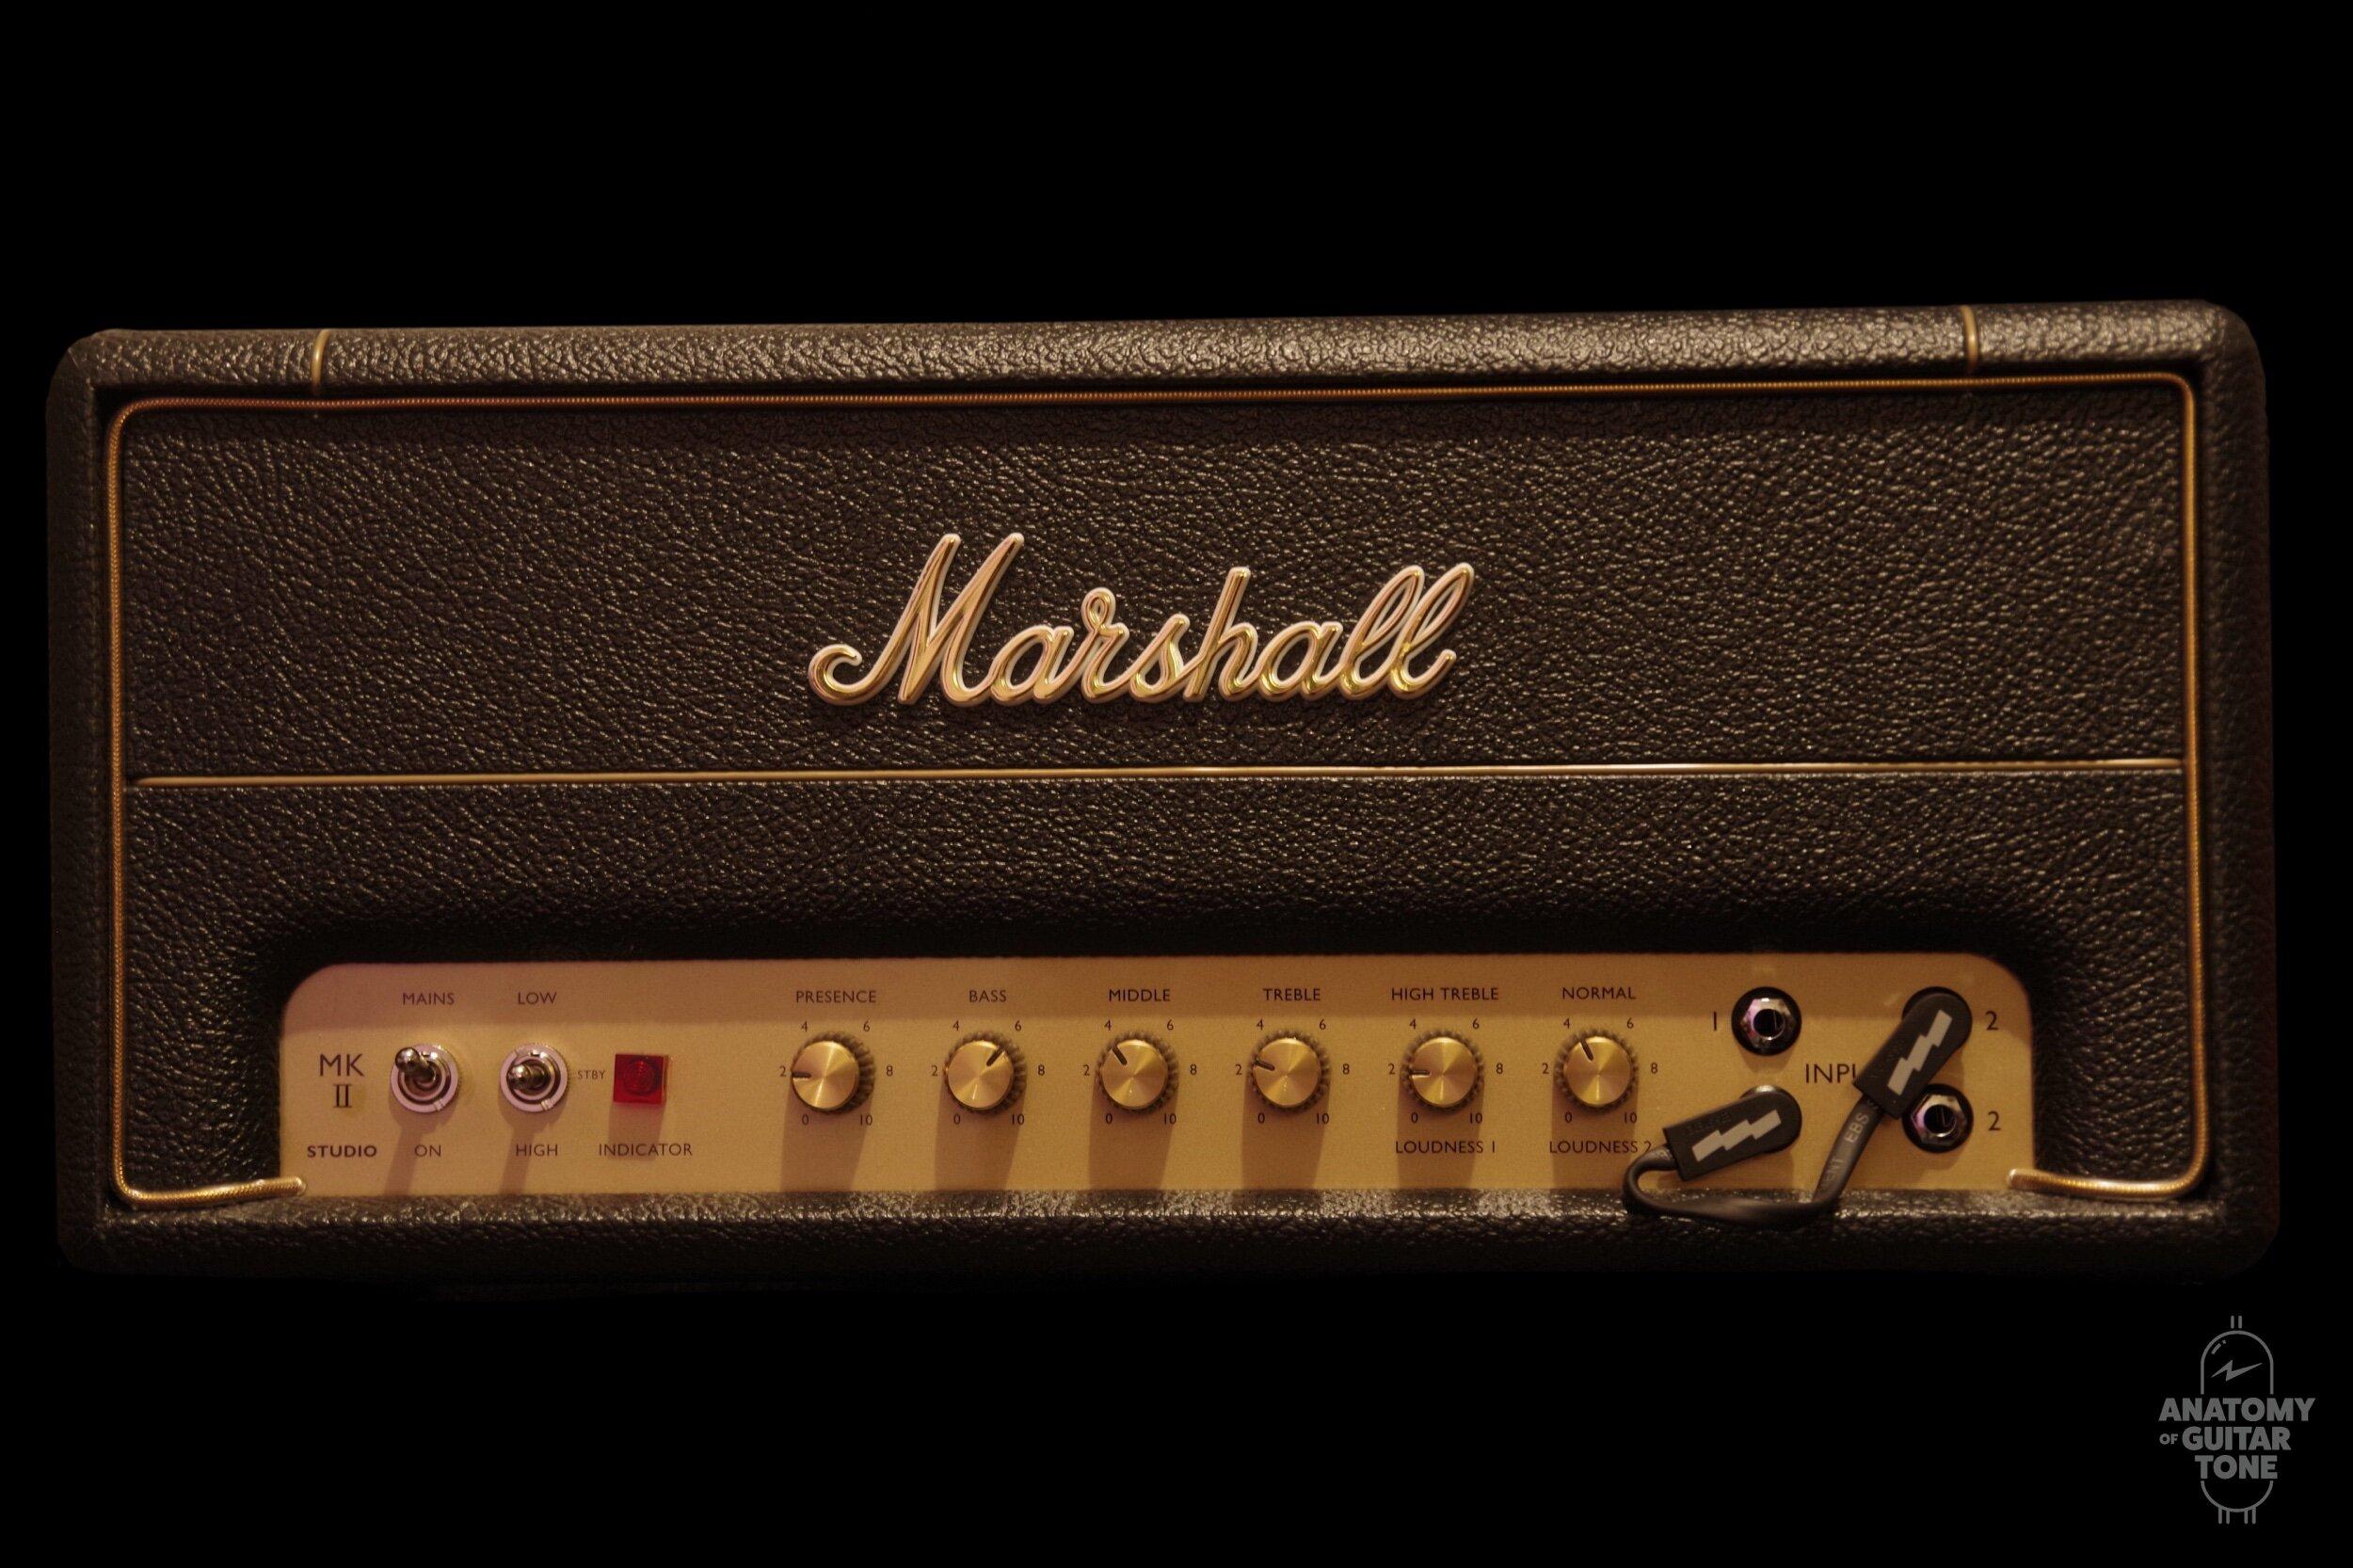 Marshall SV20H anatomy of guitar tone head.jpeg